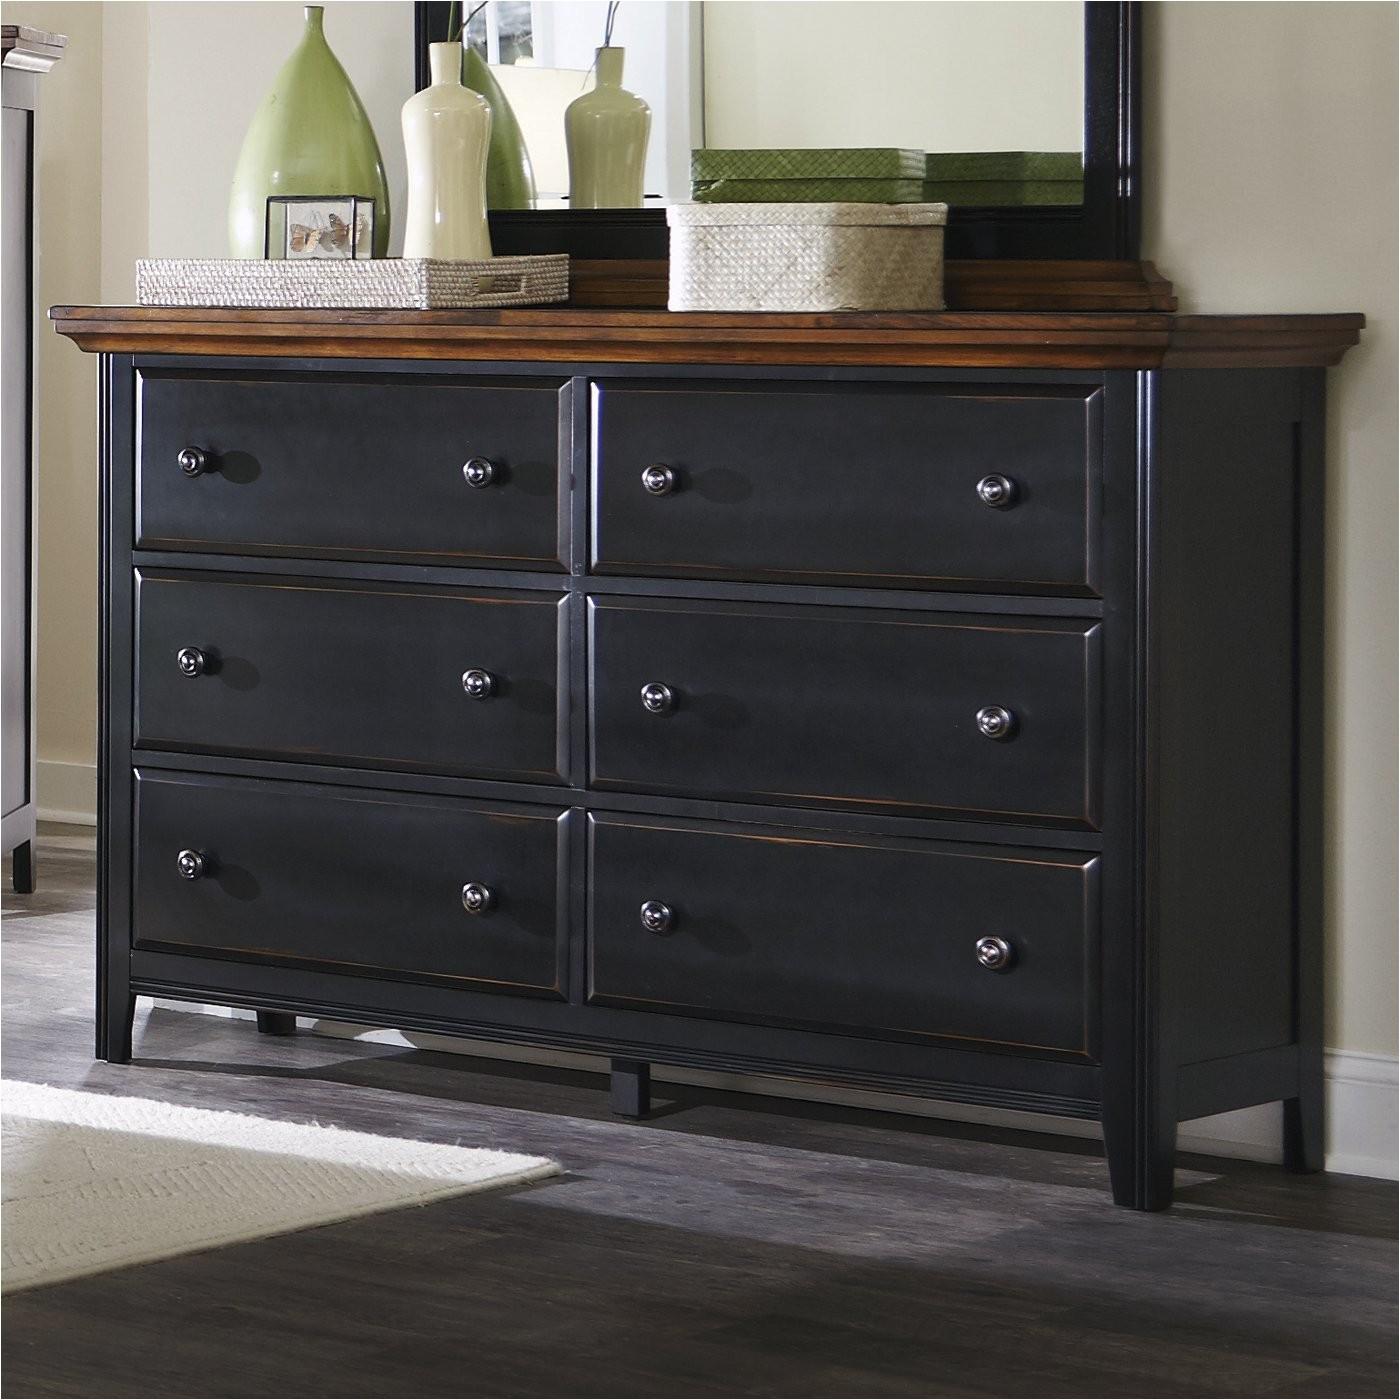 Coaster Fine Furniture Locations Coaster Fine Furniture 203153 Mabel Dresser atg Stores